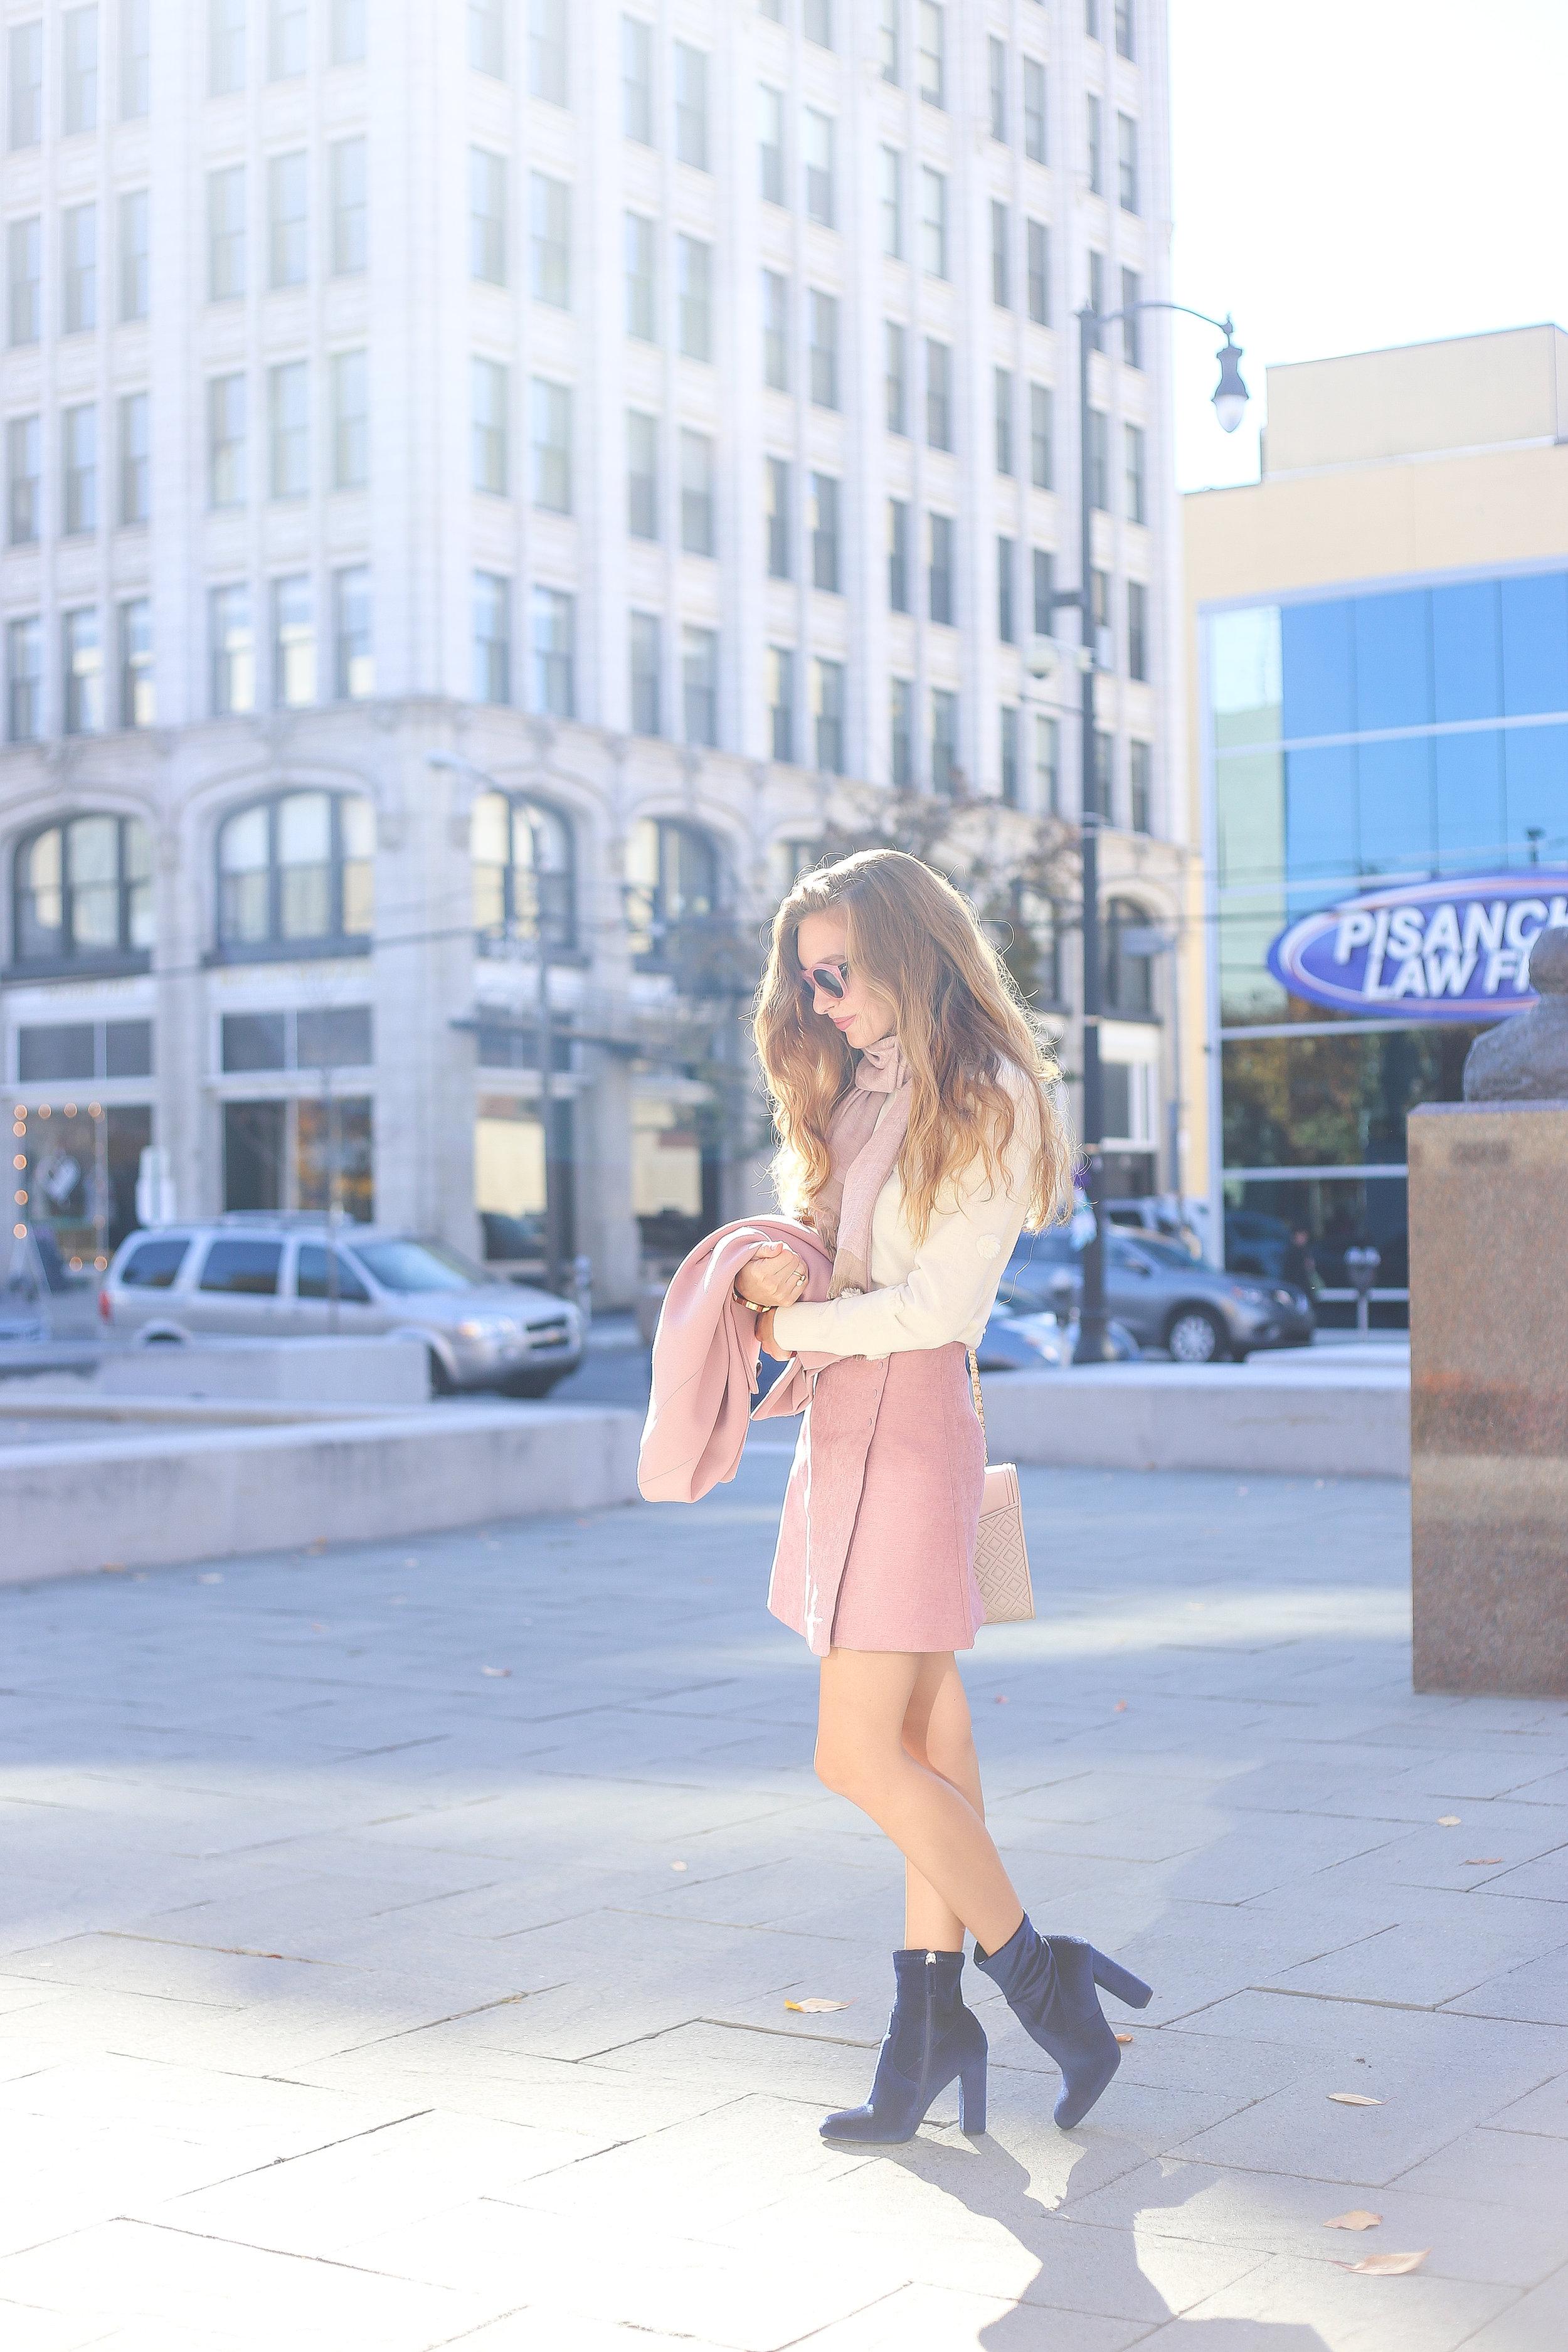 Pink Lady // Blue Suede Shoes- Enchanting Elegance